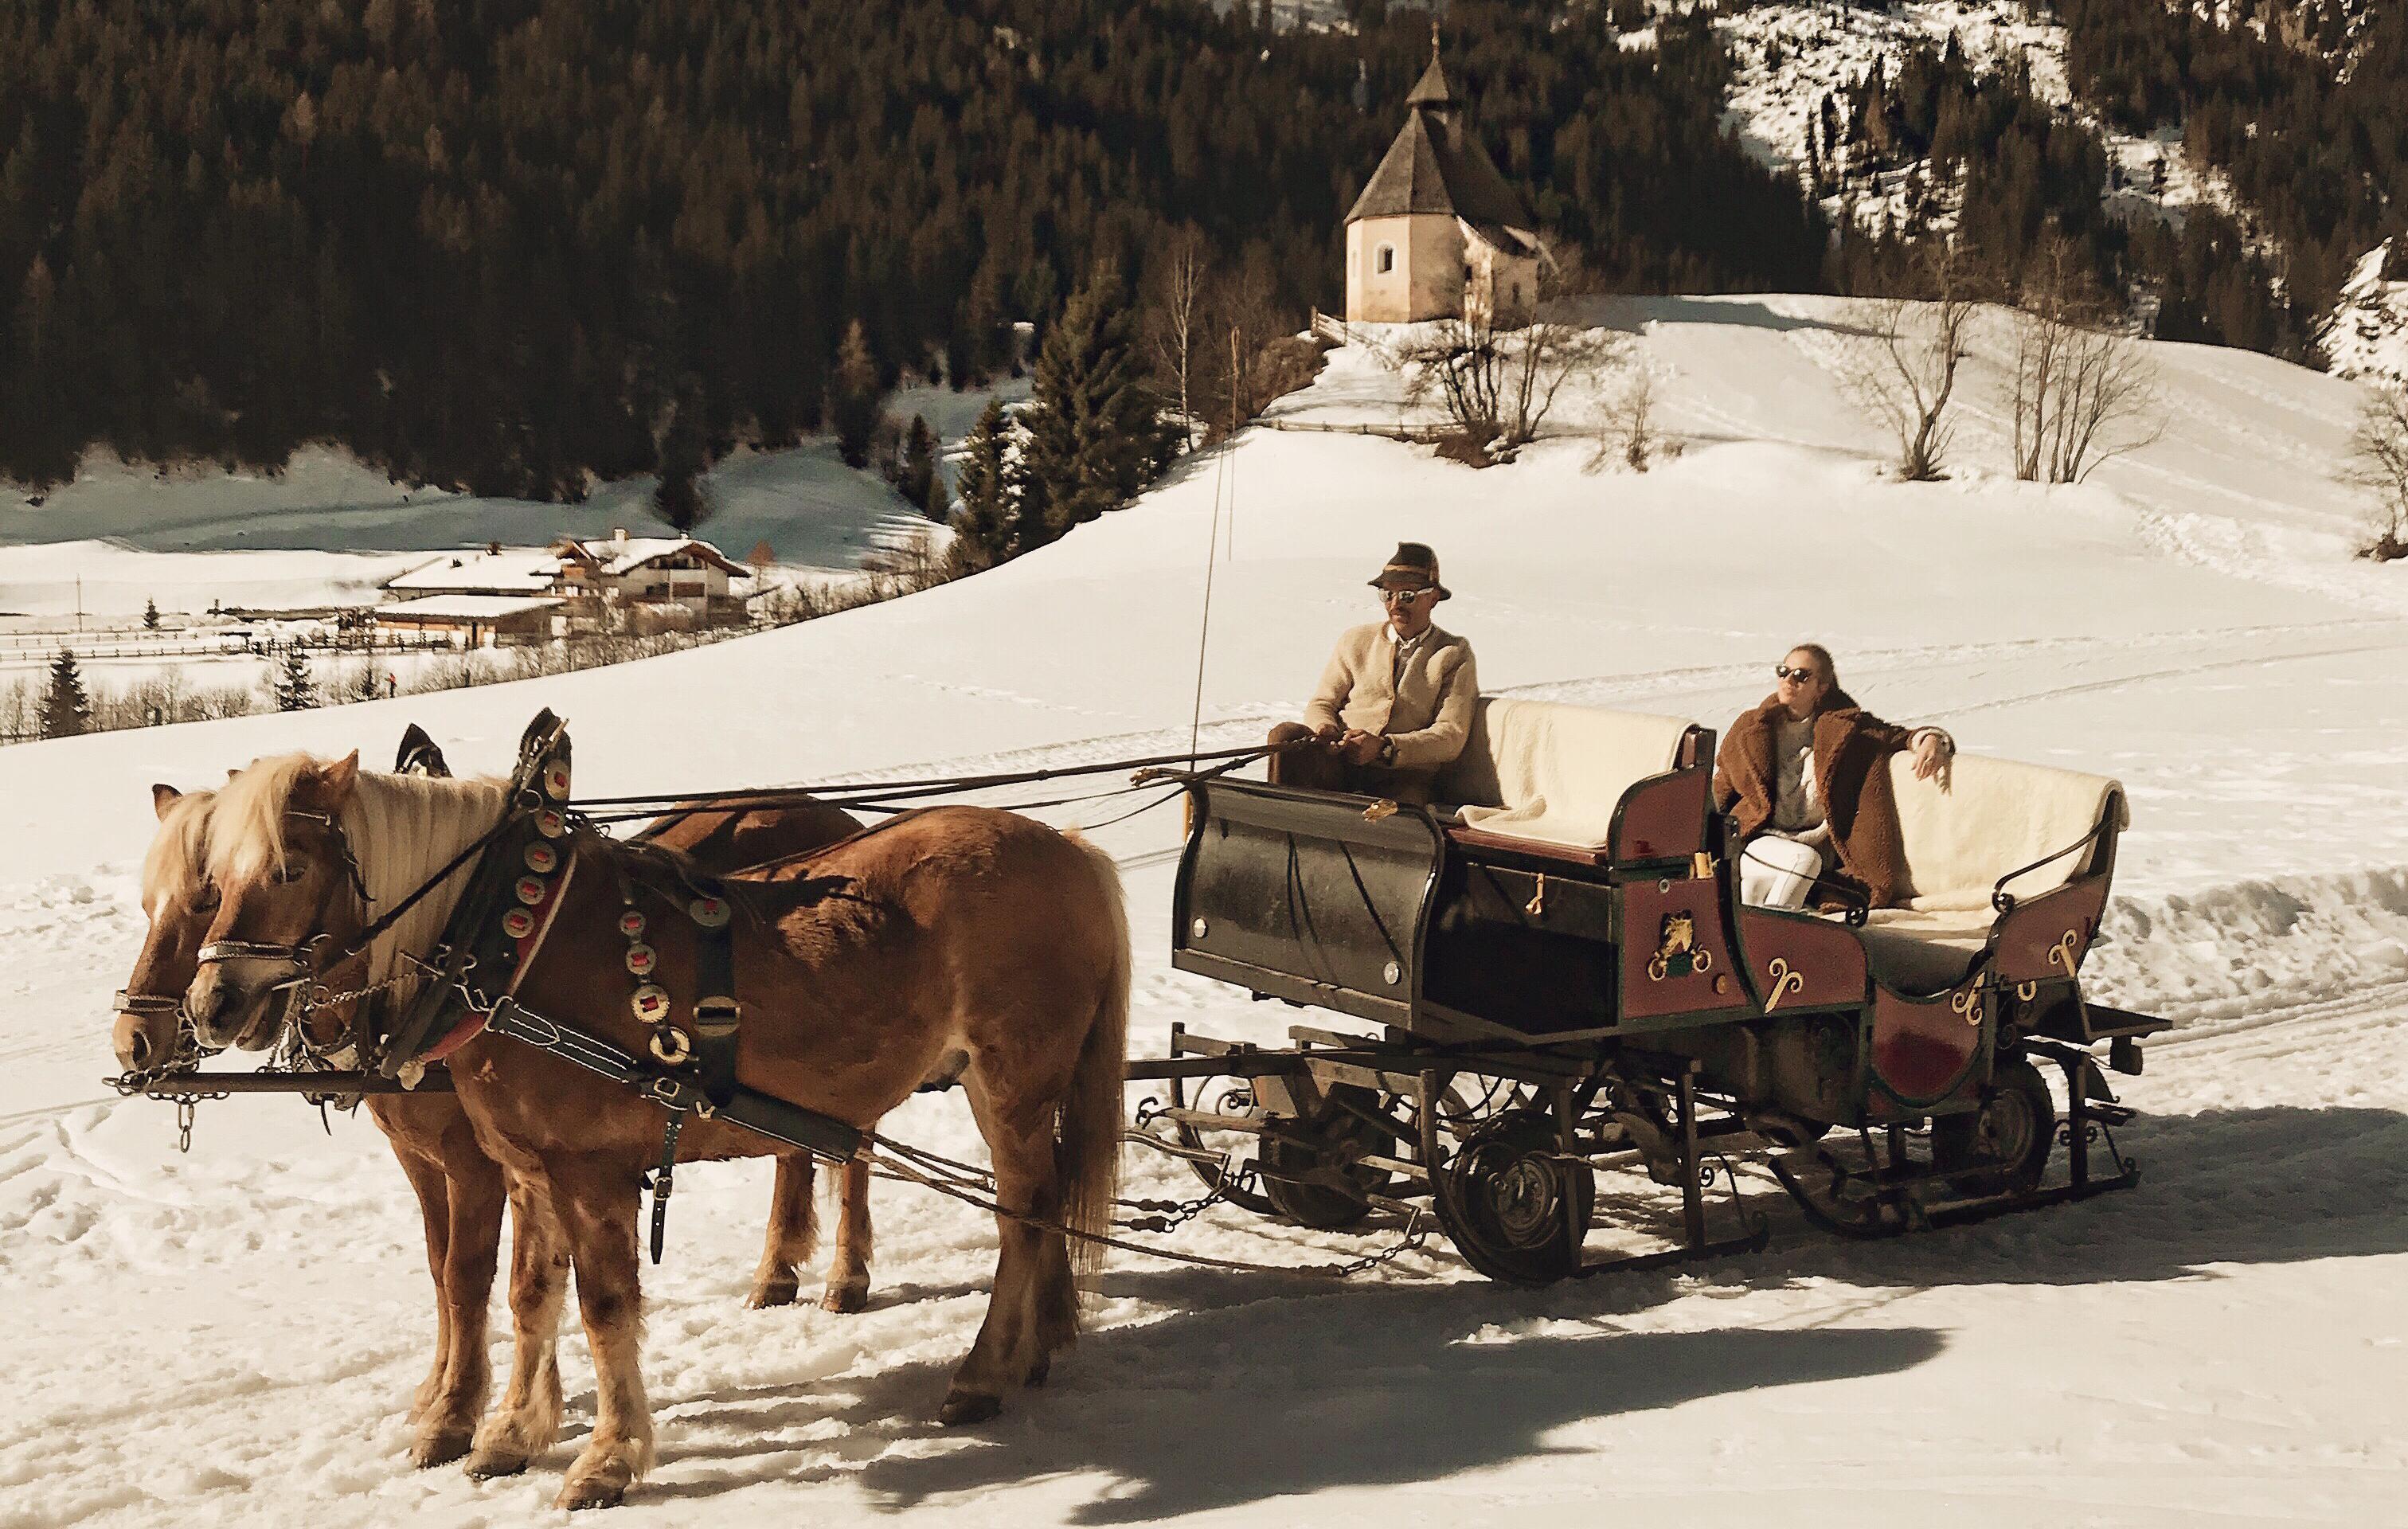 Giro in carrozza in Val Ridanna